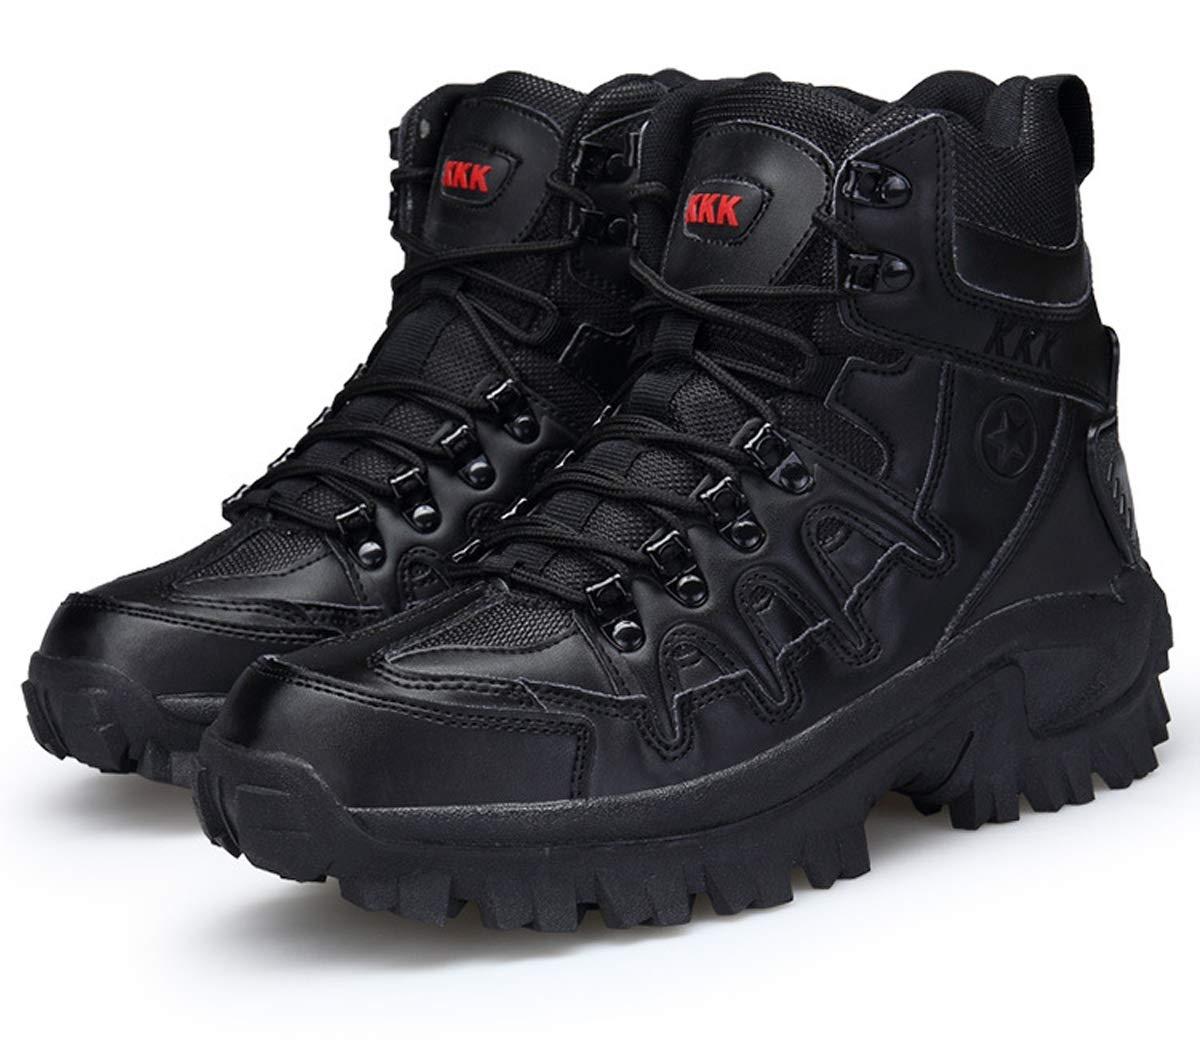 Adong  Herren Training Stiefel Wasserdichte Schuhe High Rise Wanderstiefel Bergsteigen Stiefel Non Slip Atempause Outdoor-Schuhe,B,41EU